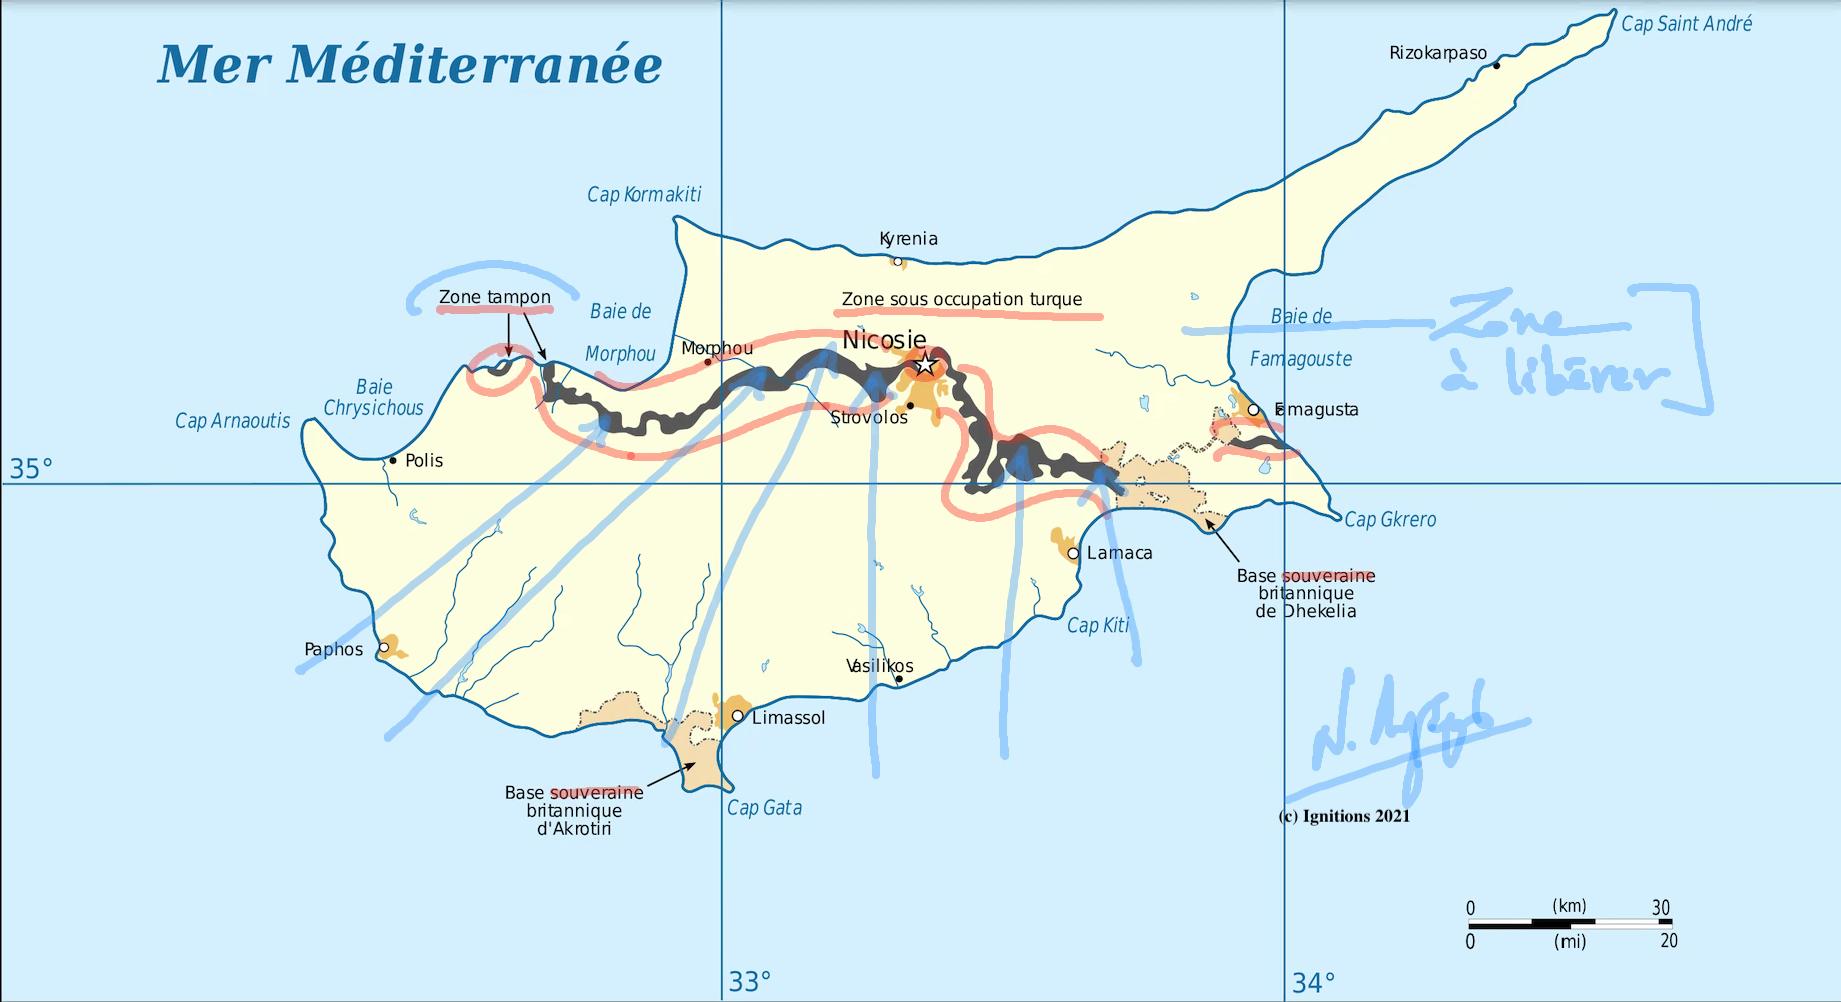 61938 - e-Μάθημα ΙΙ: Τοποστρατηγική ανάλυση κυπριακού. (Dessin)